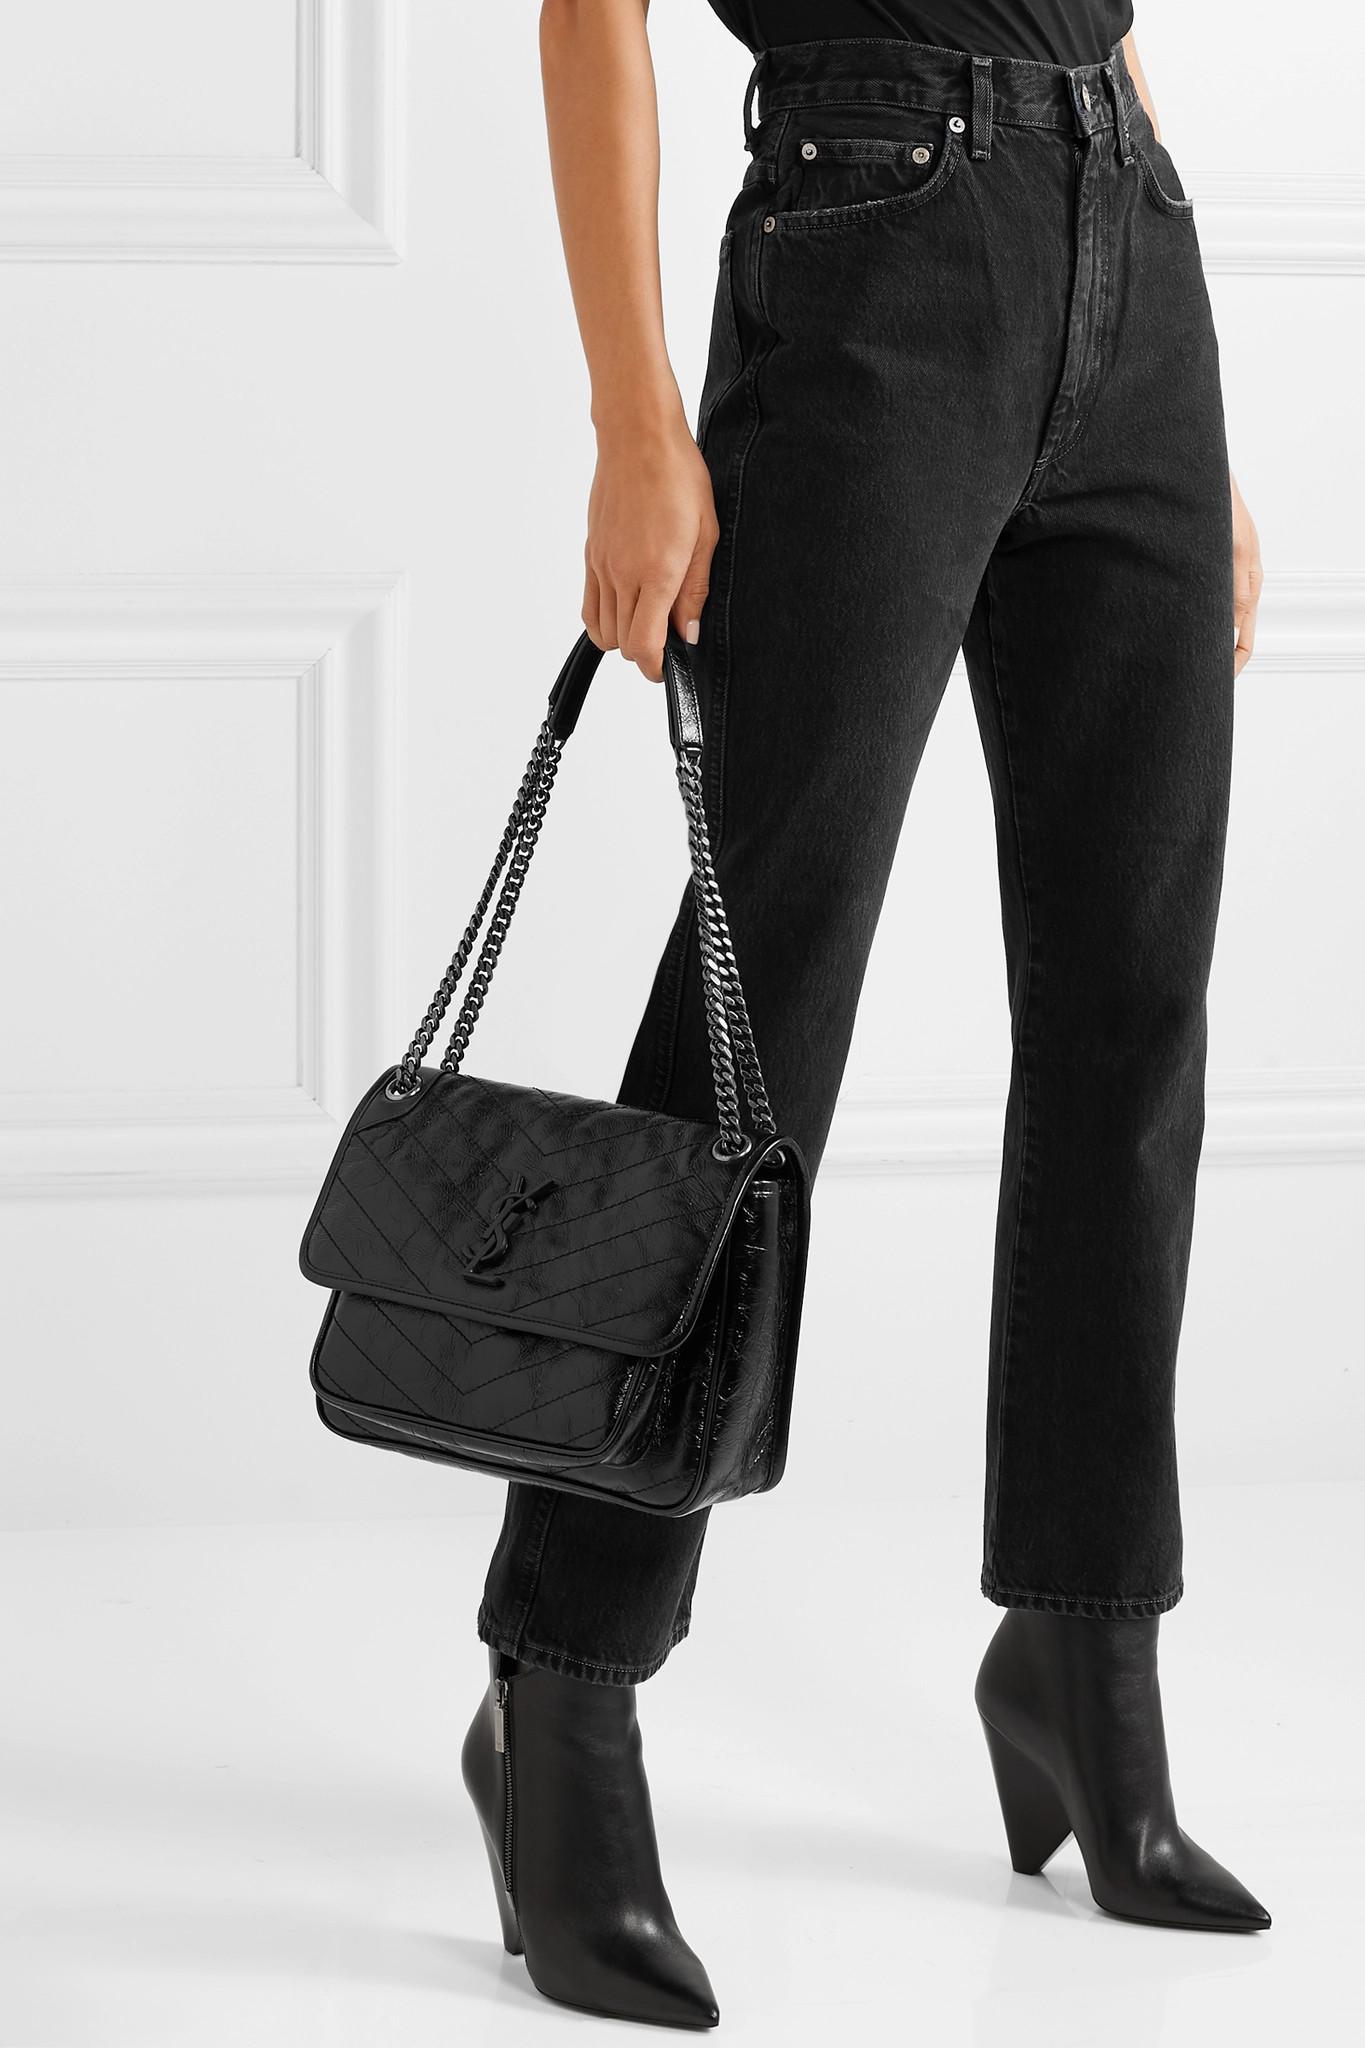 a9b007b376ff Saint Laurent - Black Niki Medium Quilted Crinkled Patent-leather Shoulder  Bag - Lyst. View fullscreen